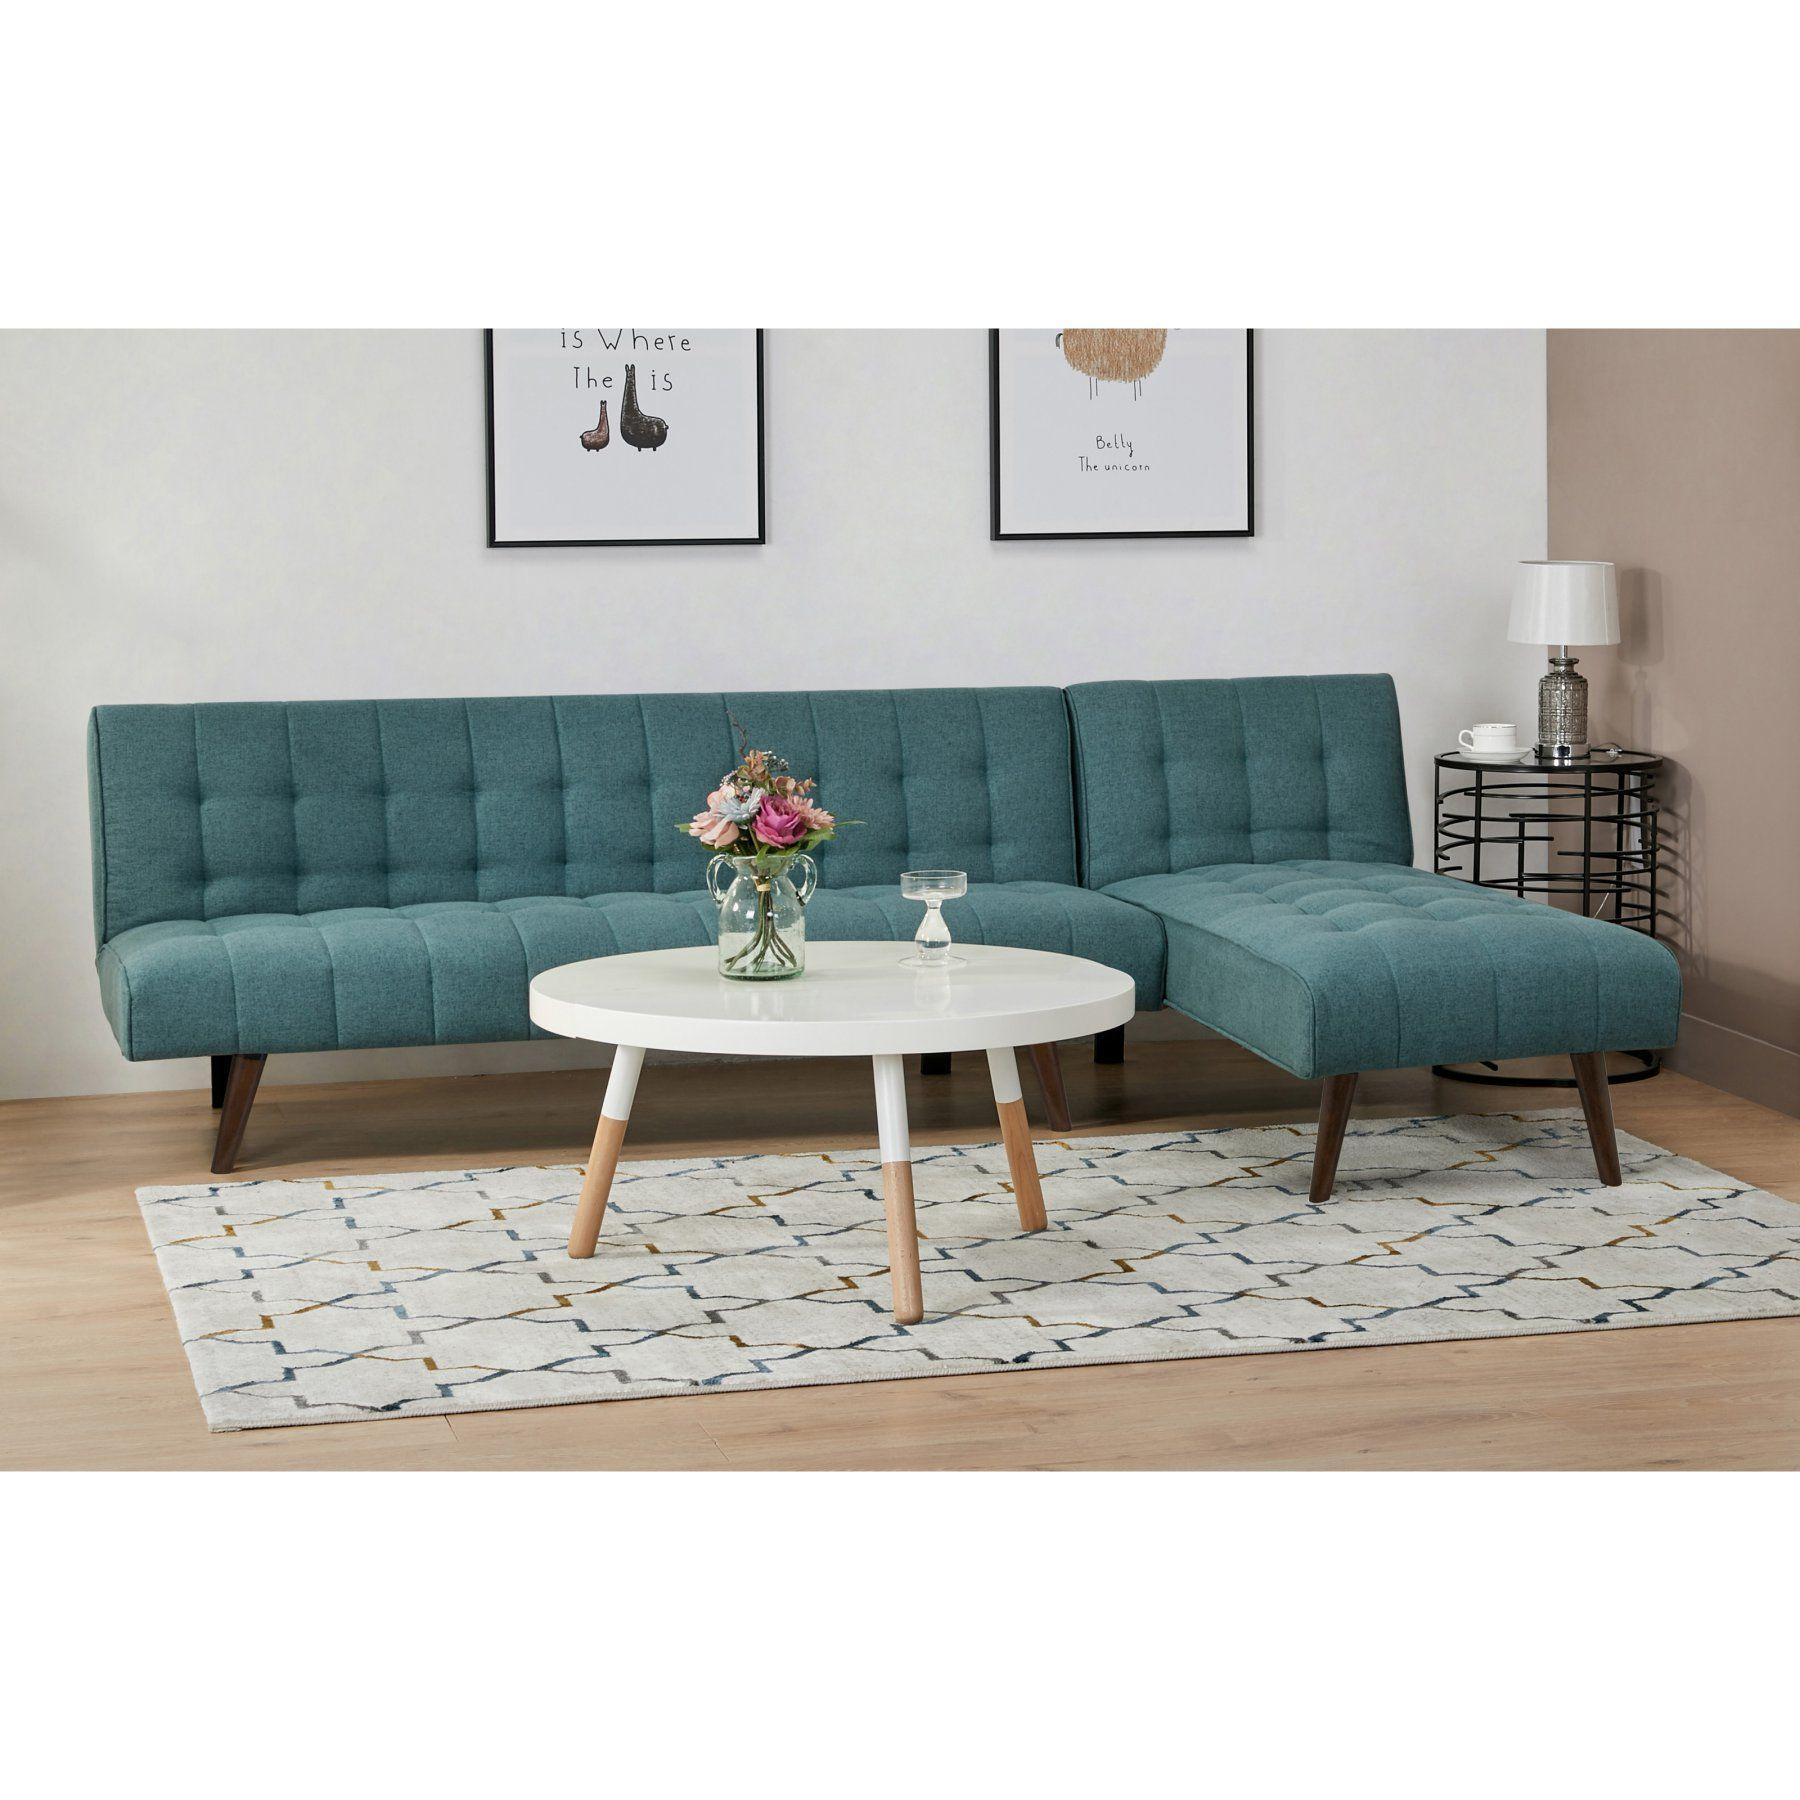 Gold Sparrow Shelton Convertible Sectional Sofa Bed ...